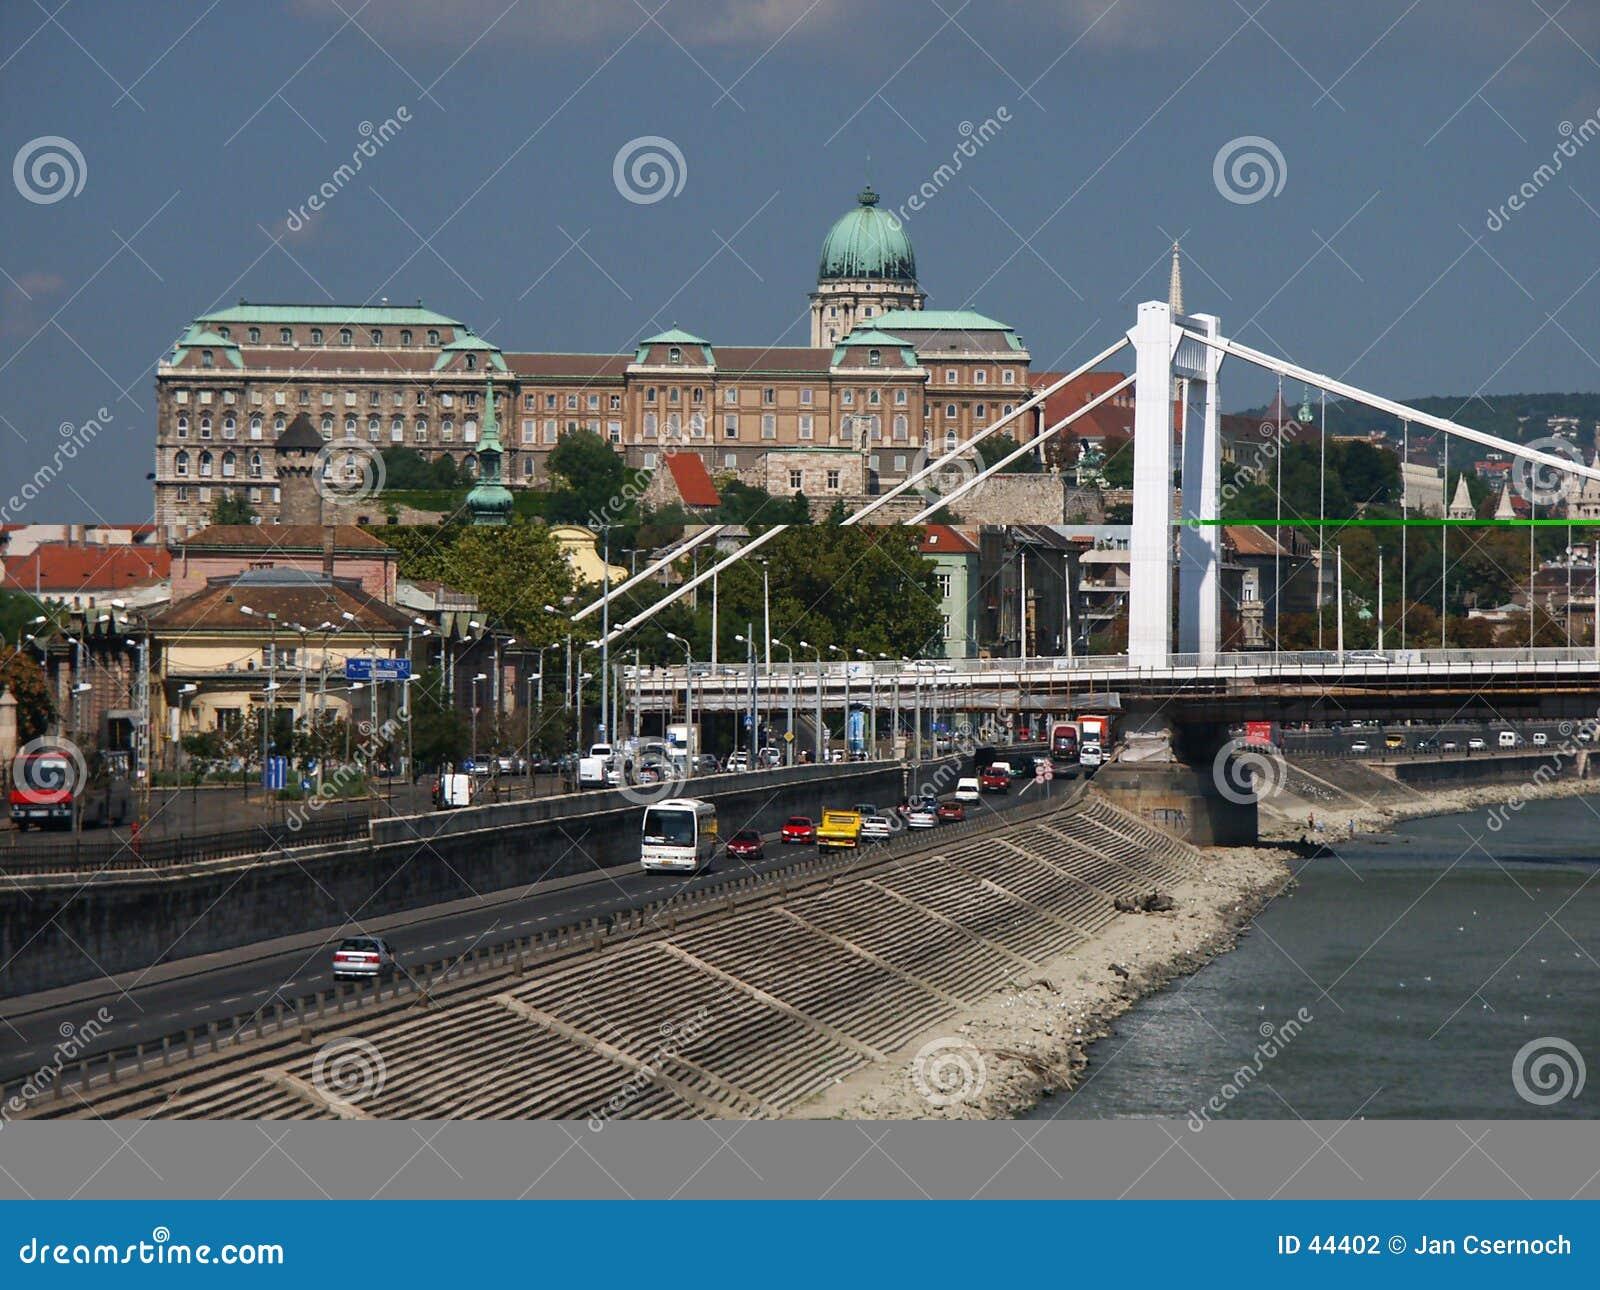 Download Buda Castle And Elizabet Bridge Stock Photo - Image of water, cupola: 44402